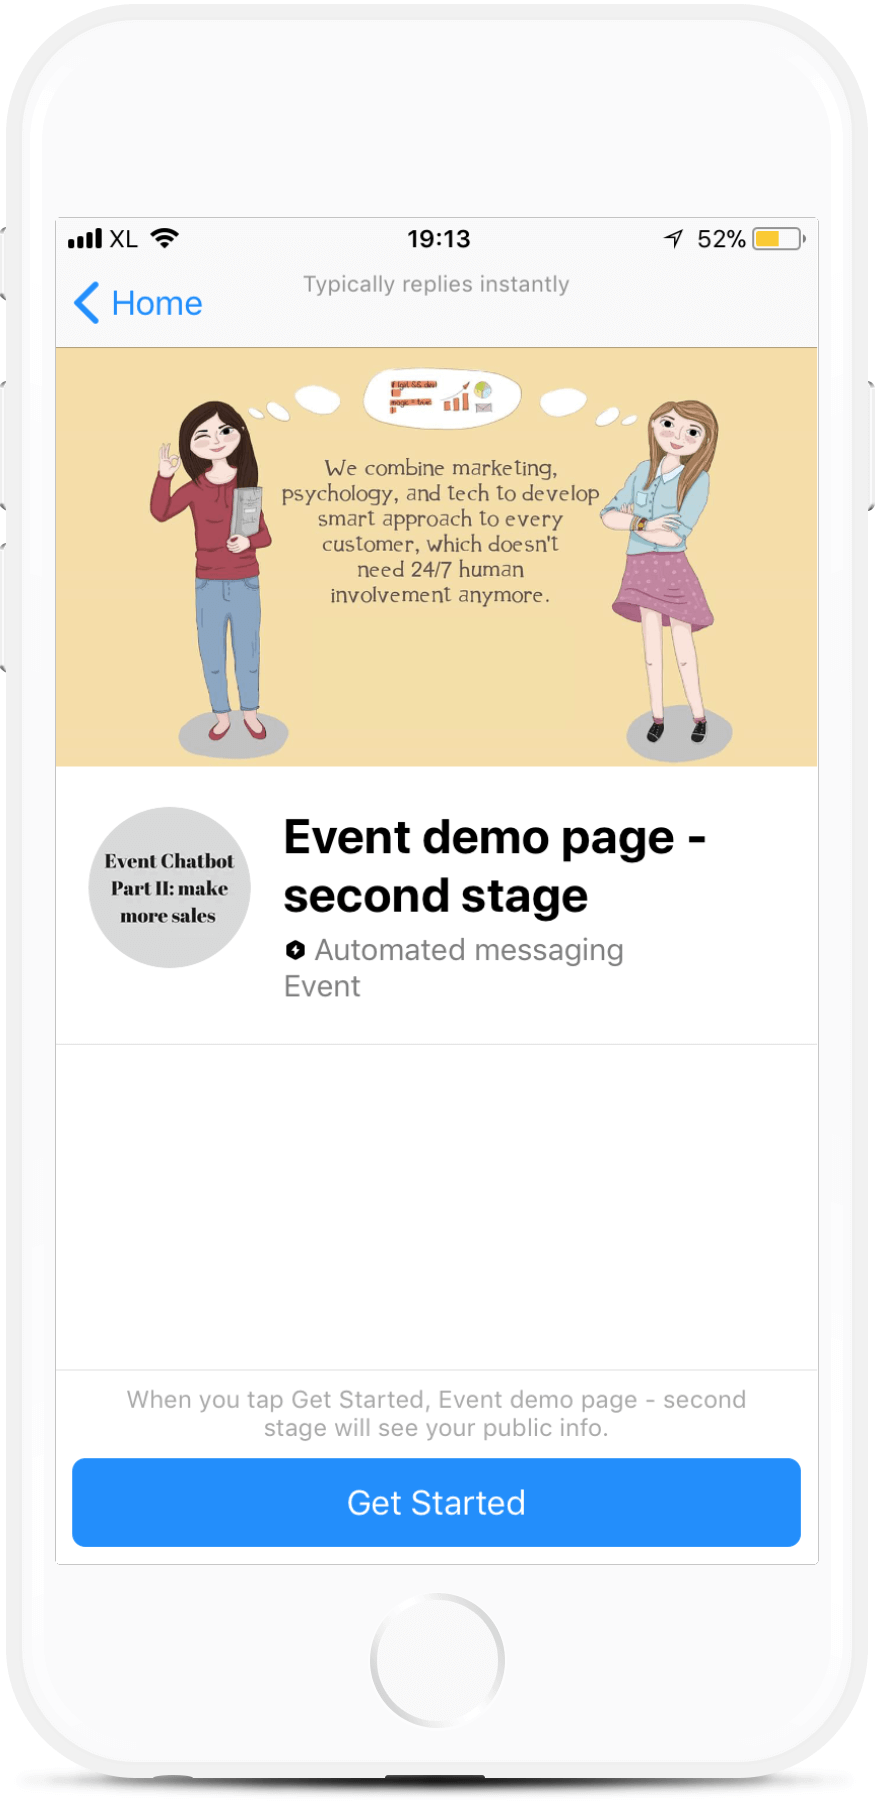 Event Chatbot Part II